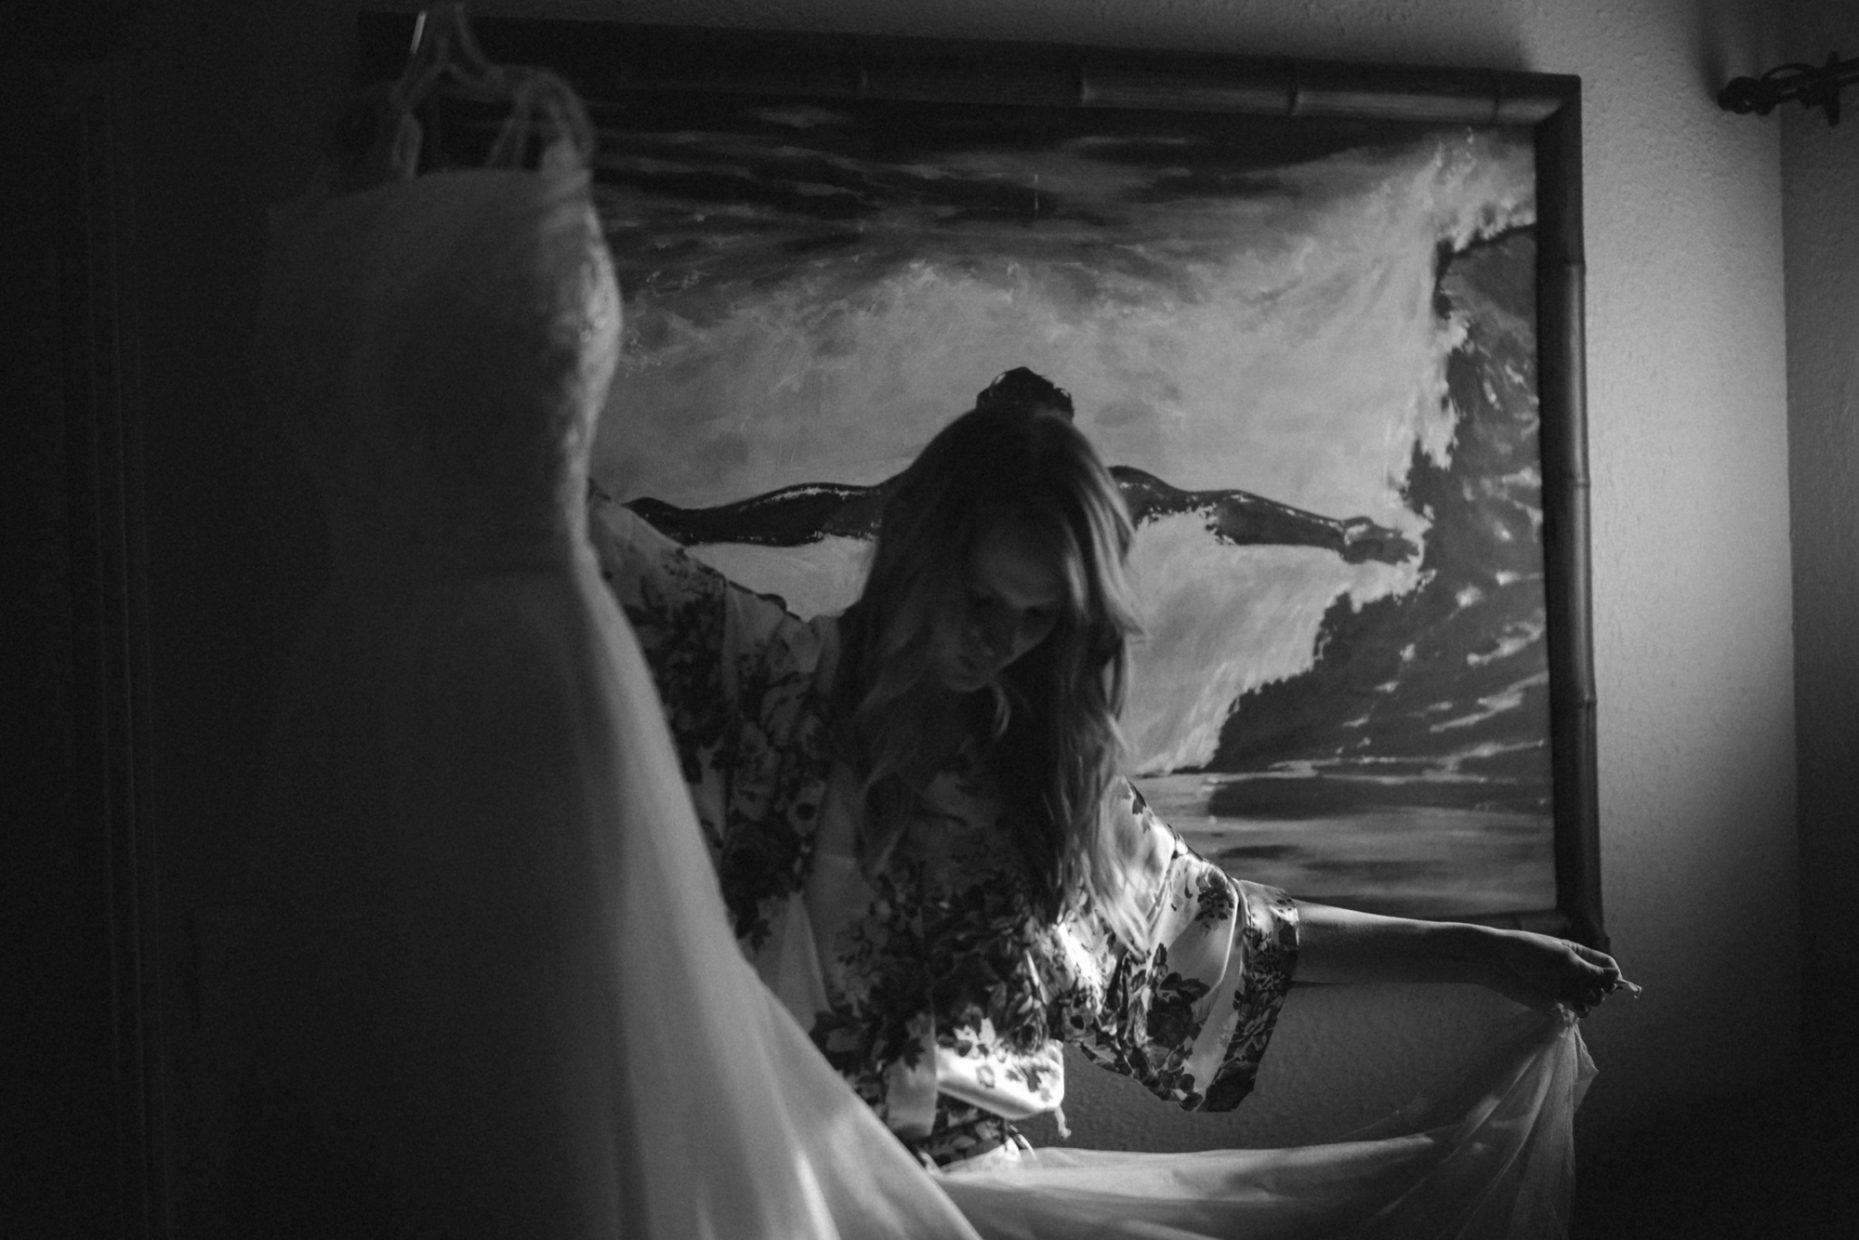 Malibu coast restaurant wedding california beach duke's intimate small ceremony bhldn